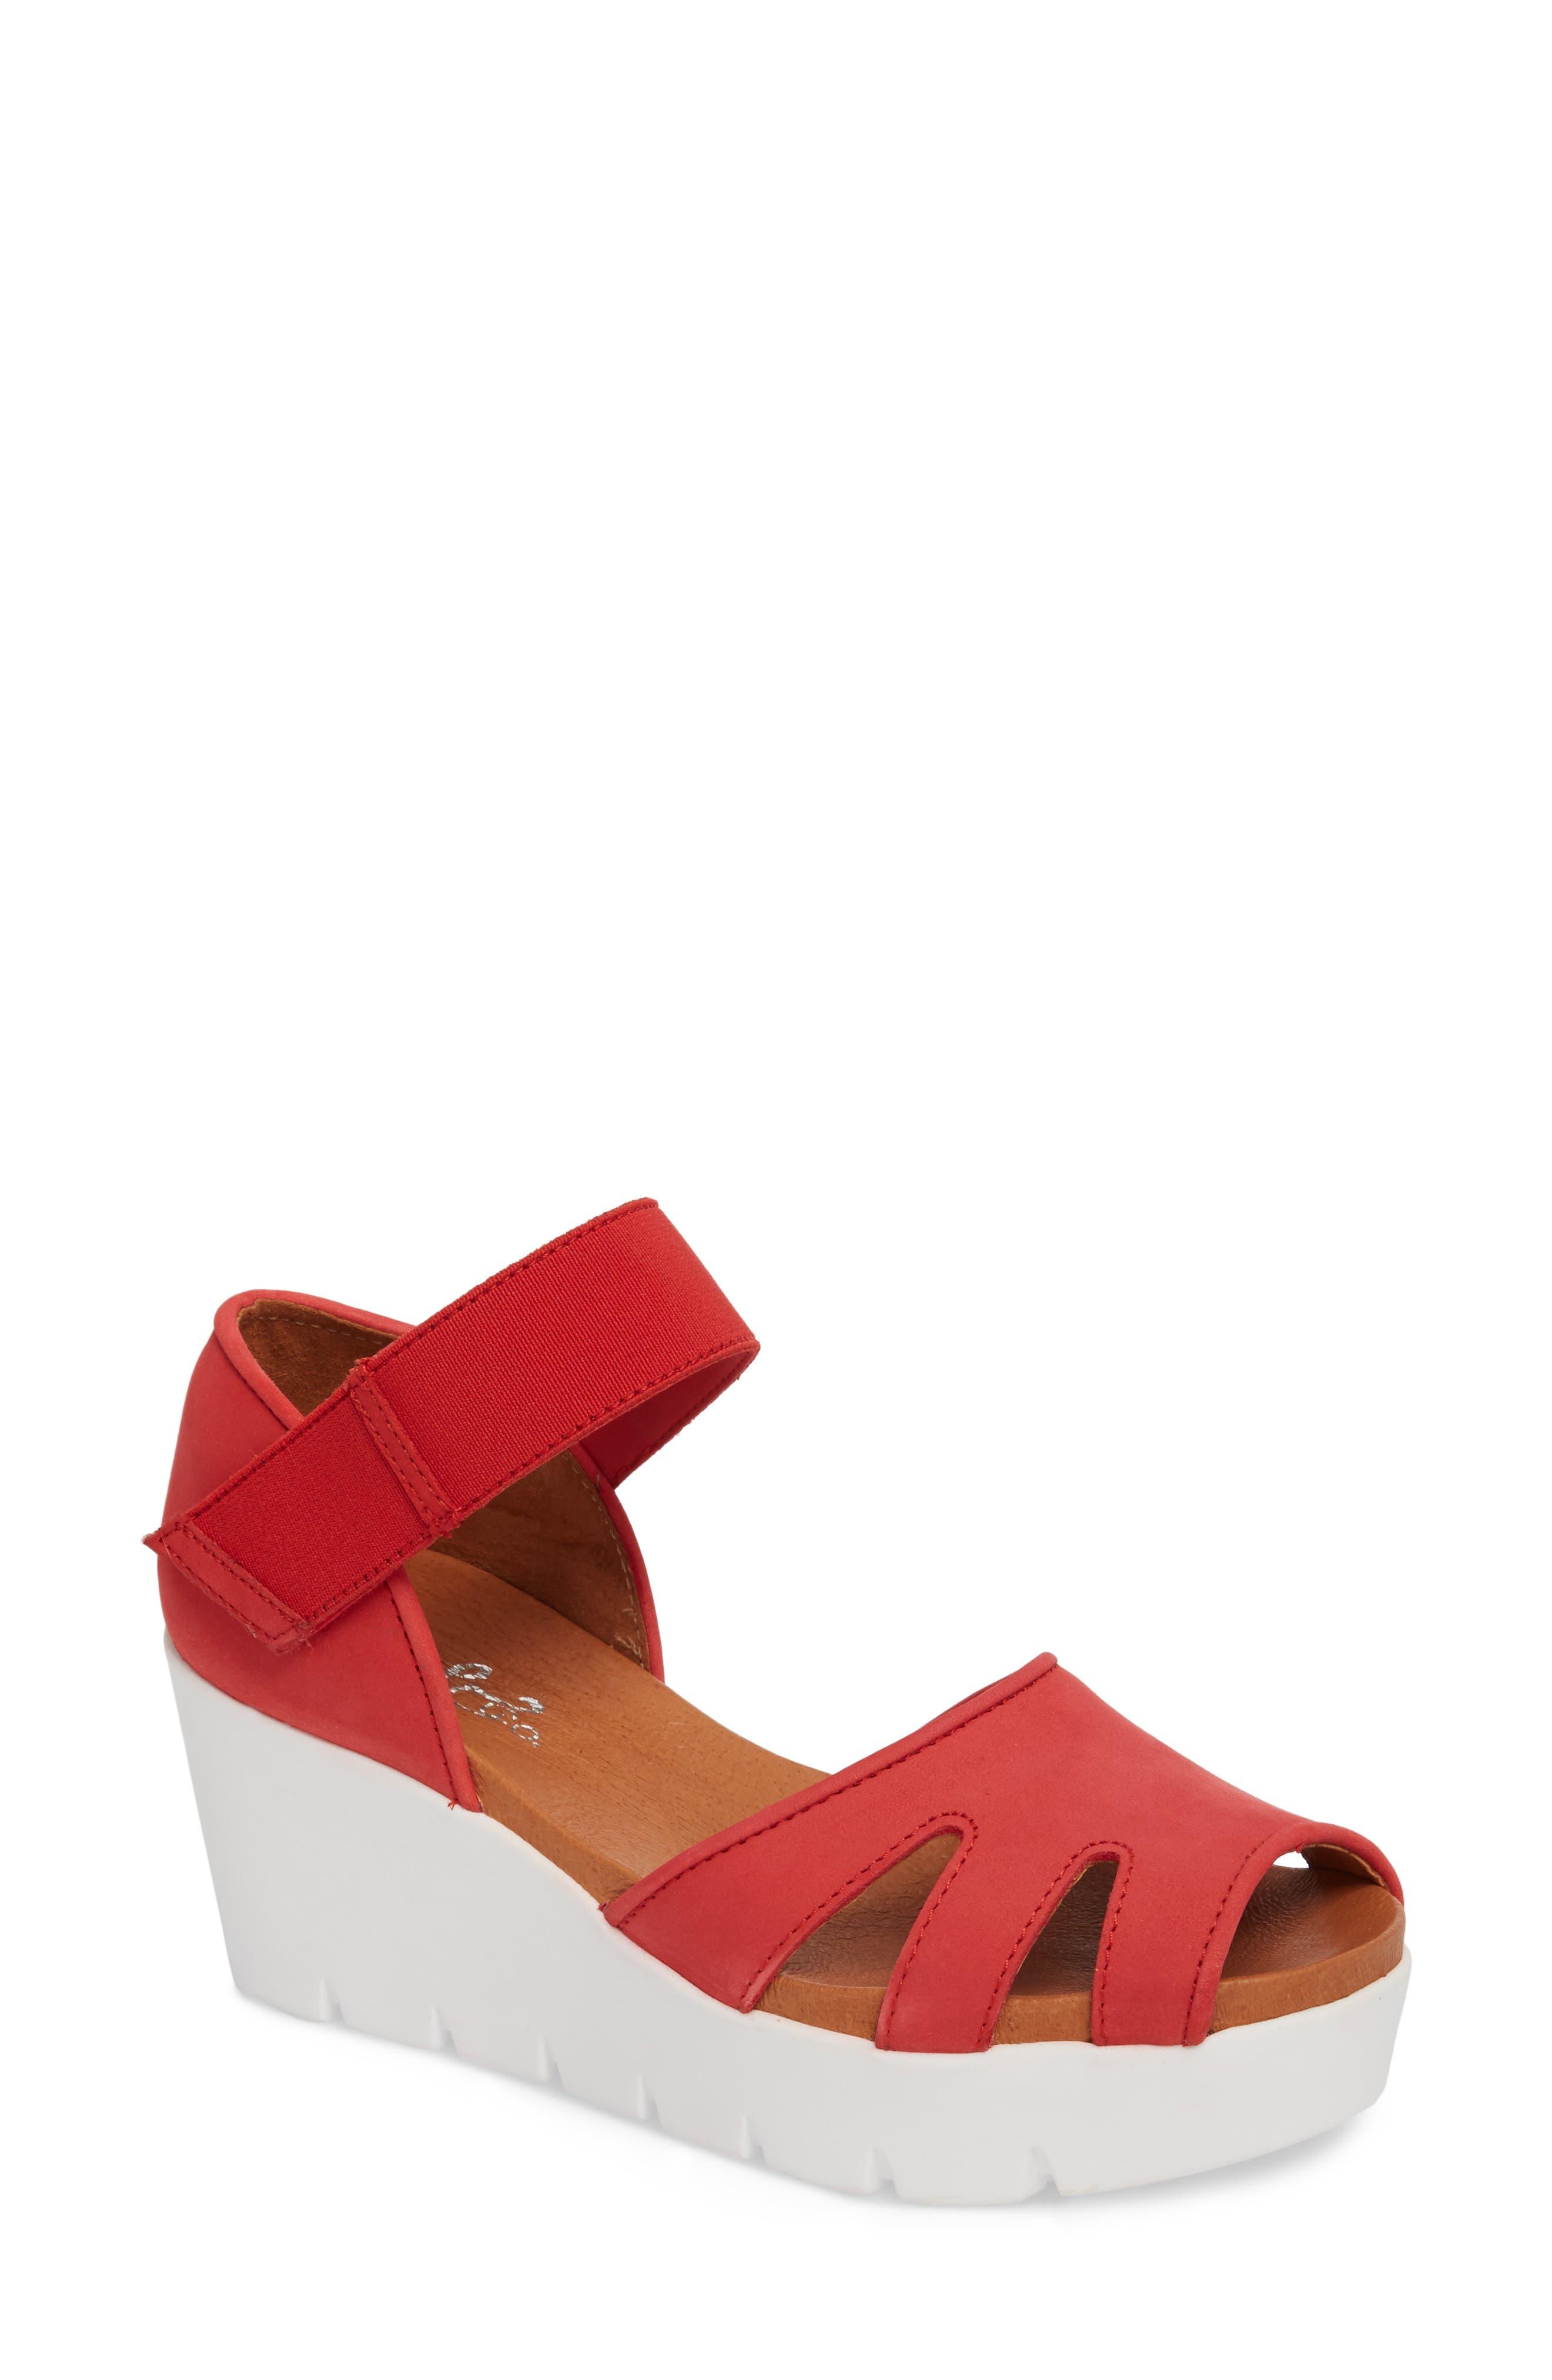 Bos. & Co. Sharon Platform Wedge Sandal - Red